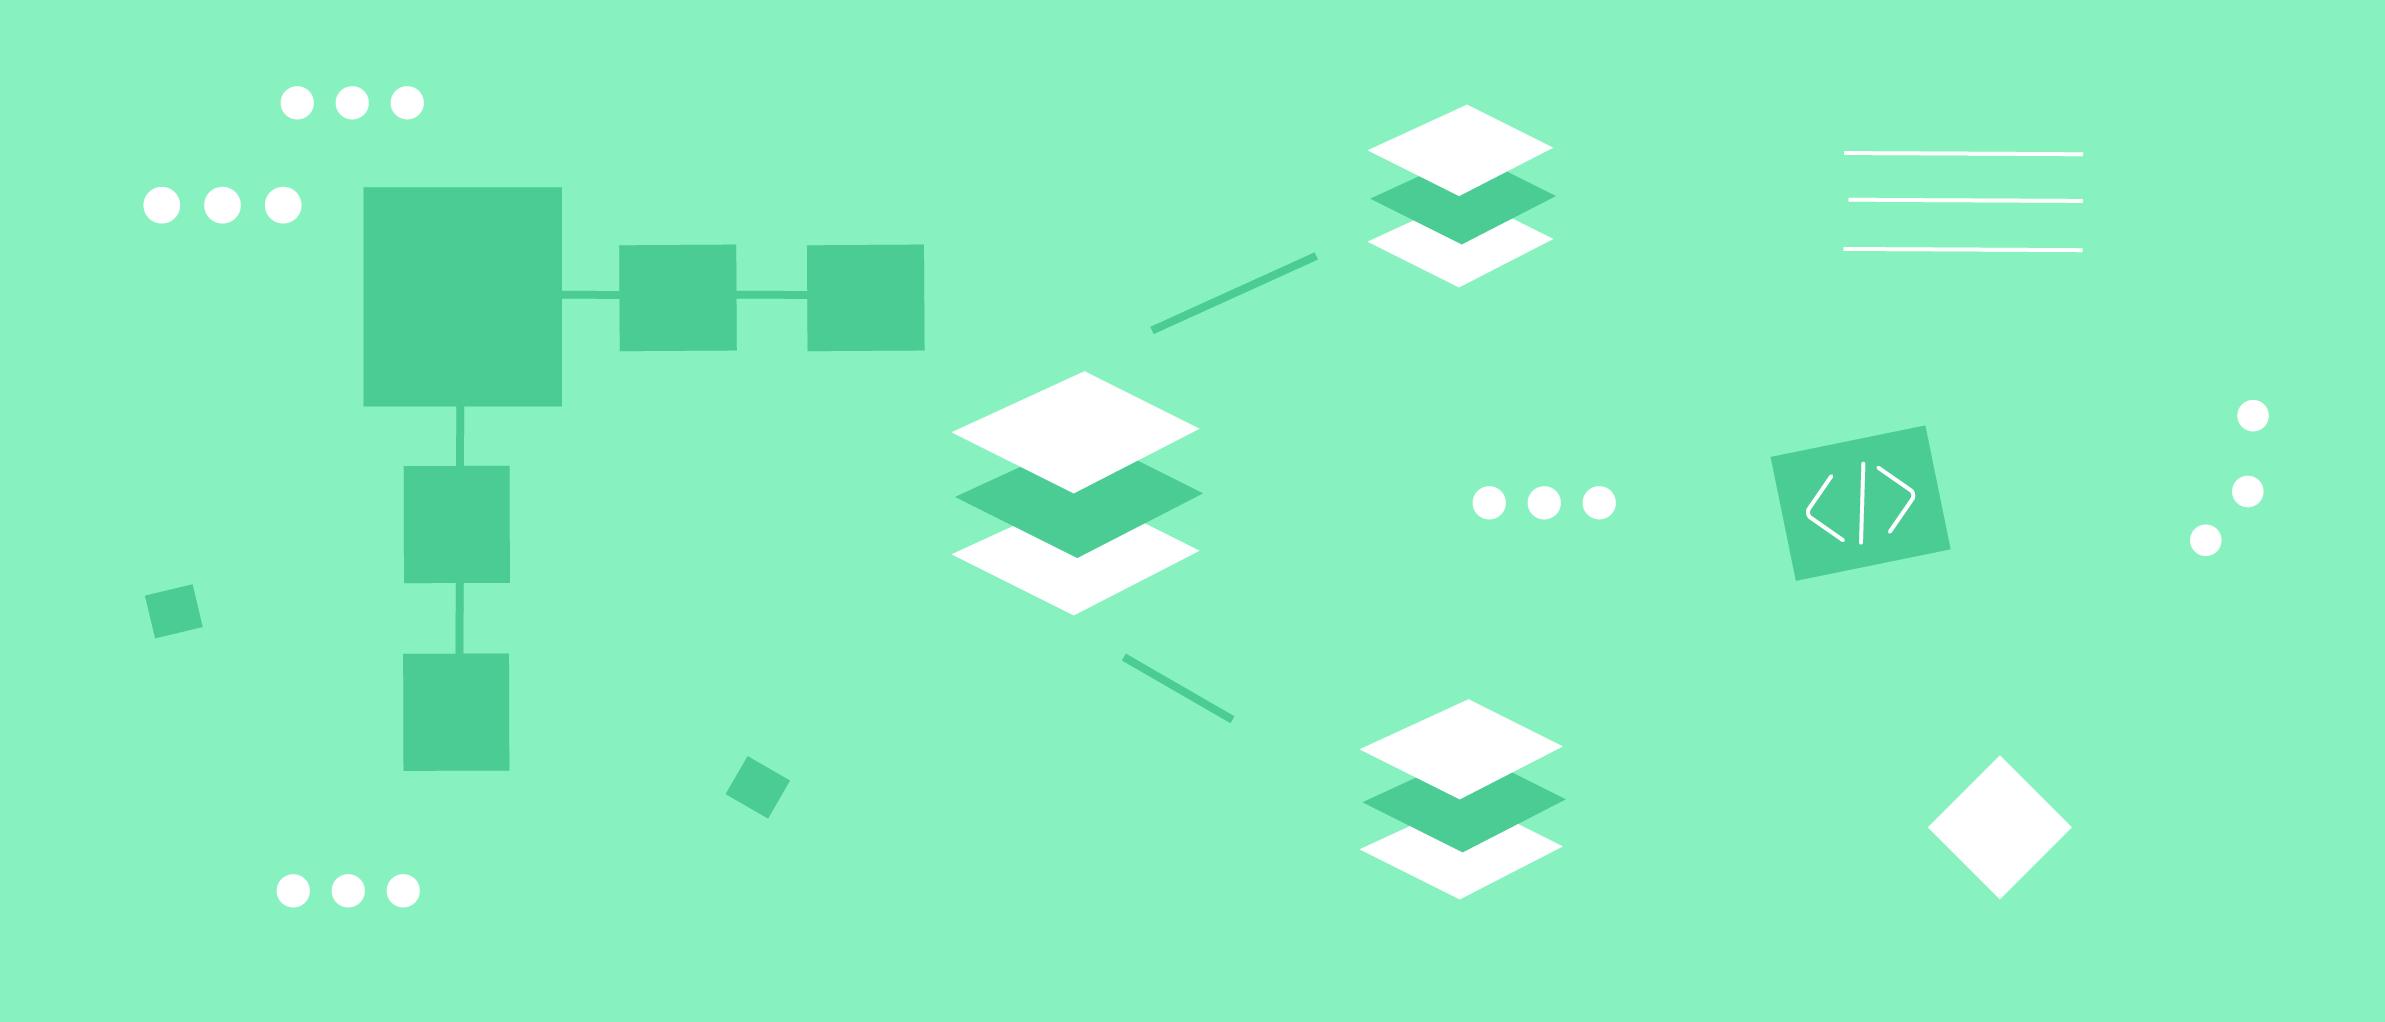 tray-resourcetile-apistack-green@4x